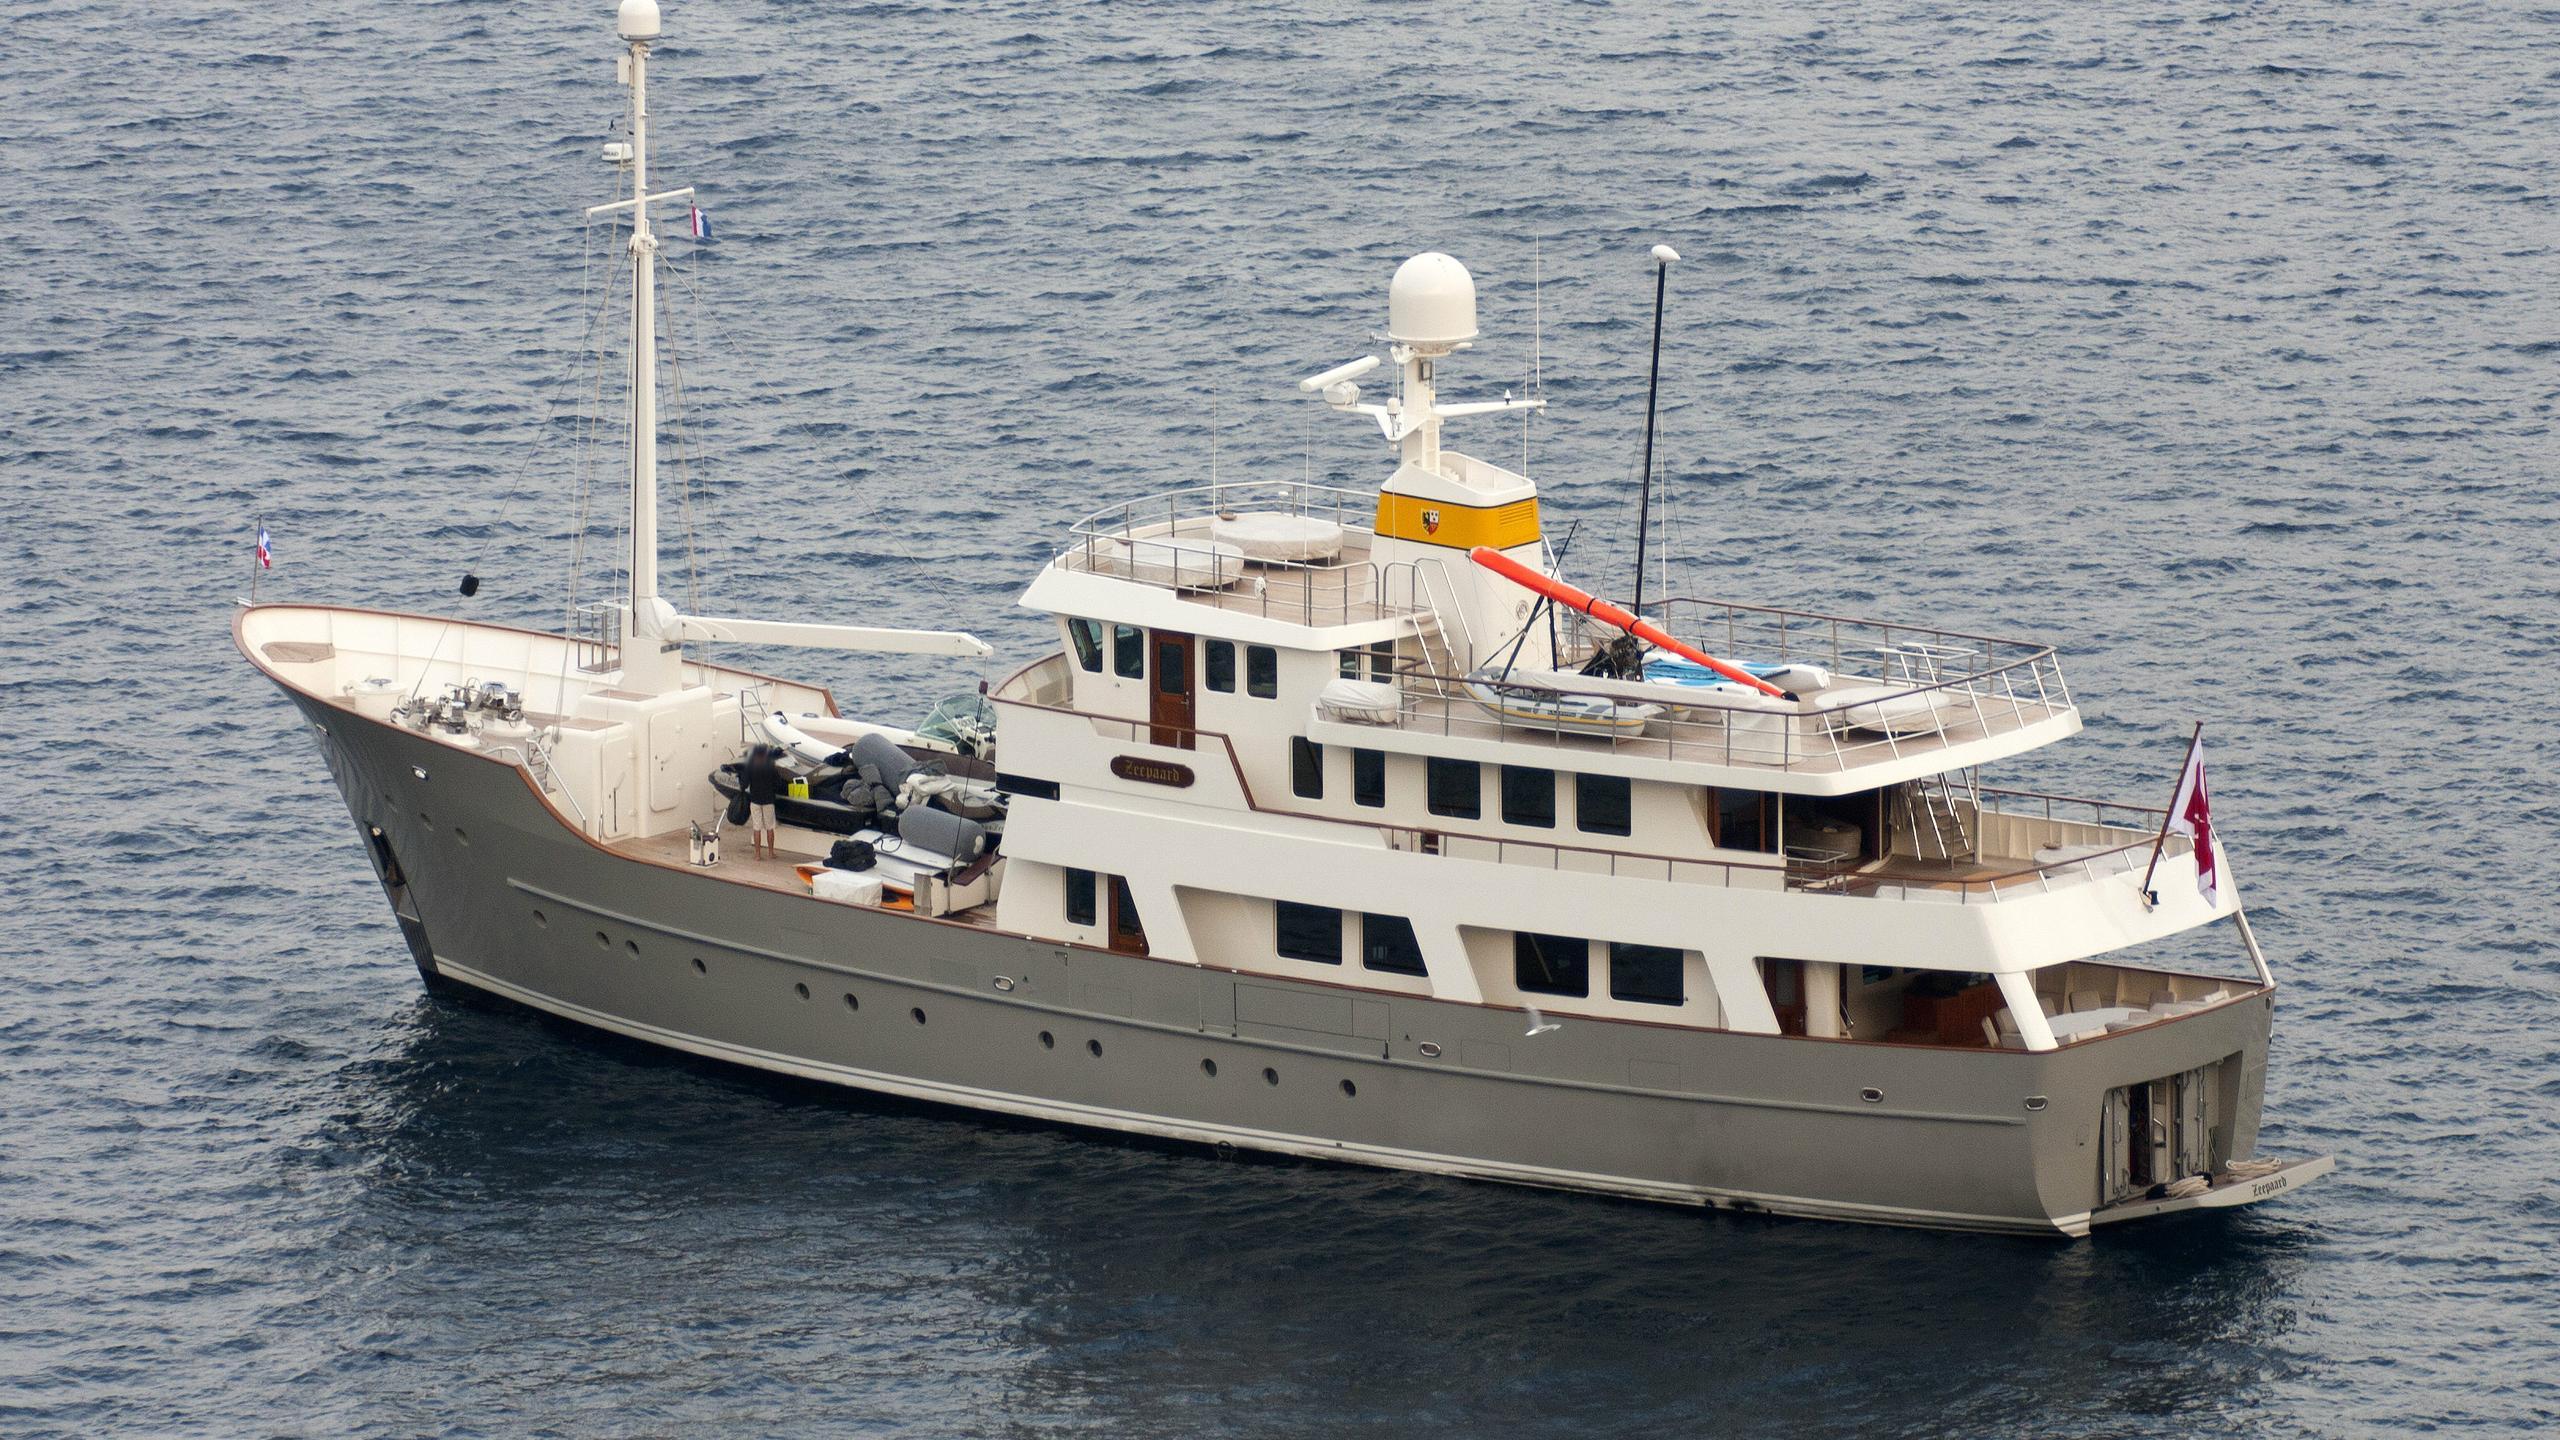 zeepaard-explorer-yacht-jfa-2003-37m-half-aerial